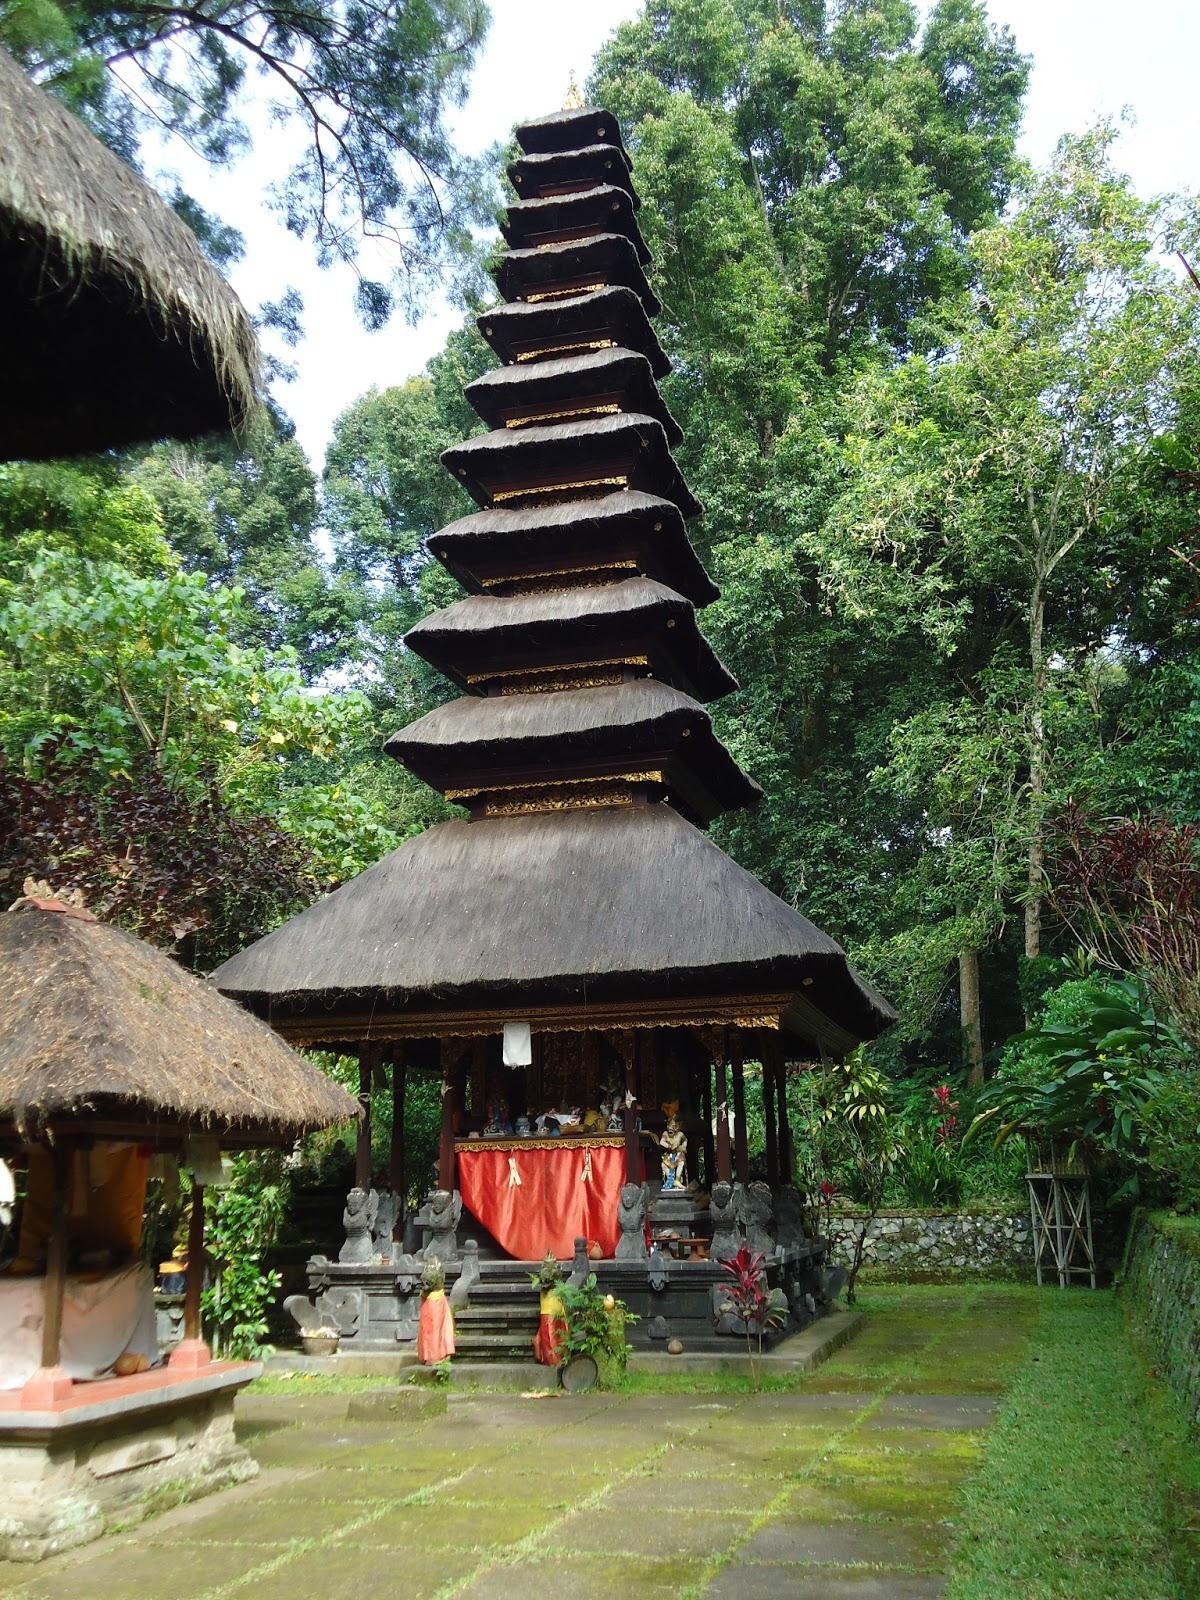 Temple-luhur-besikalung-bali. 2